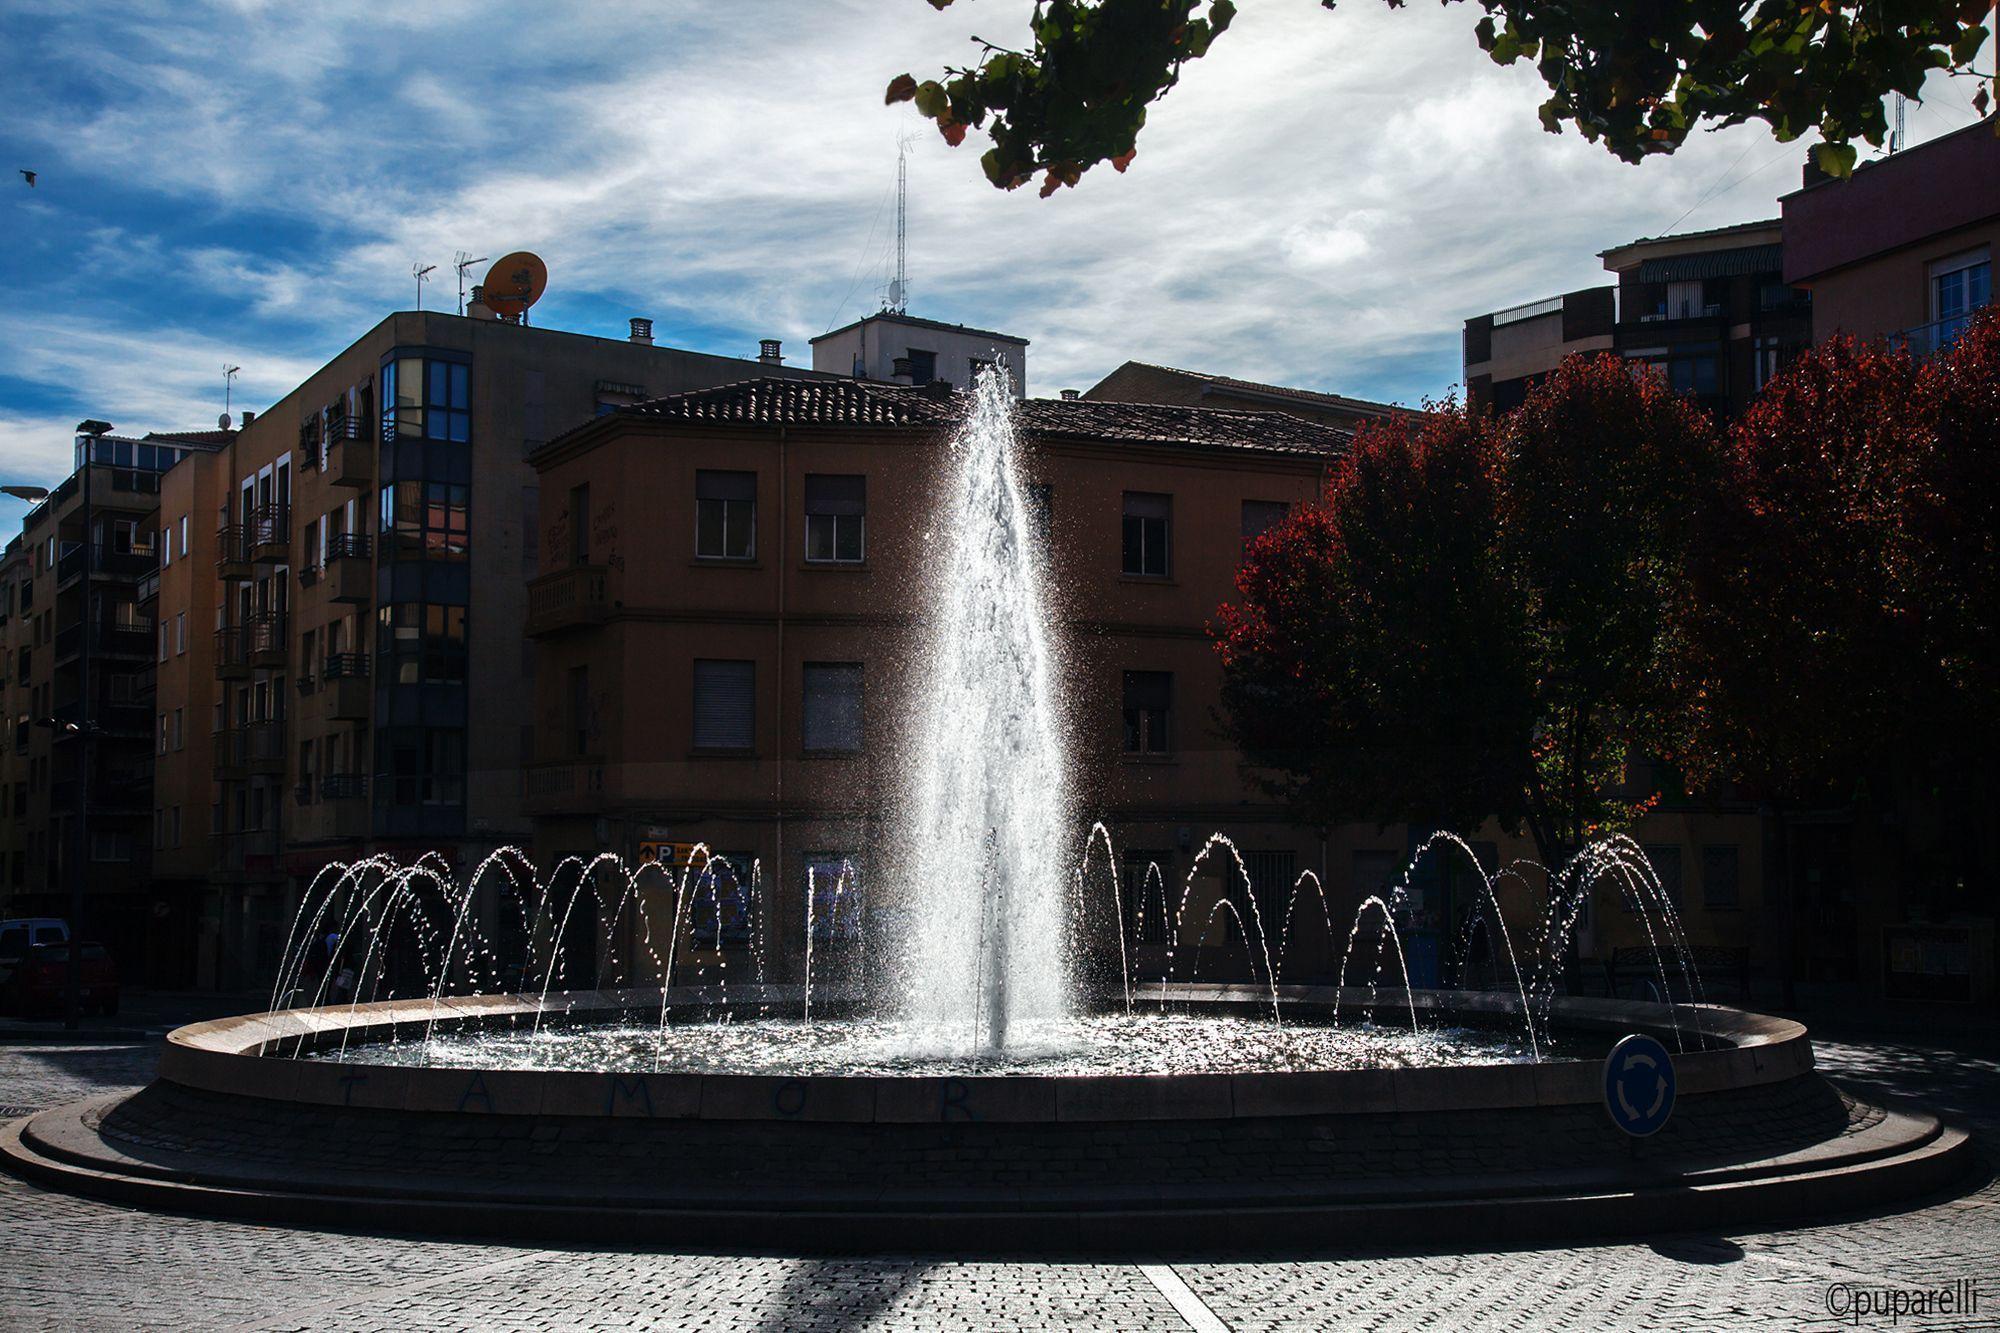 Plaza Oeste. Otoño. Foto de Puparelli